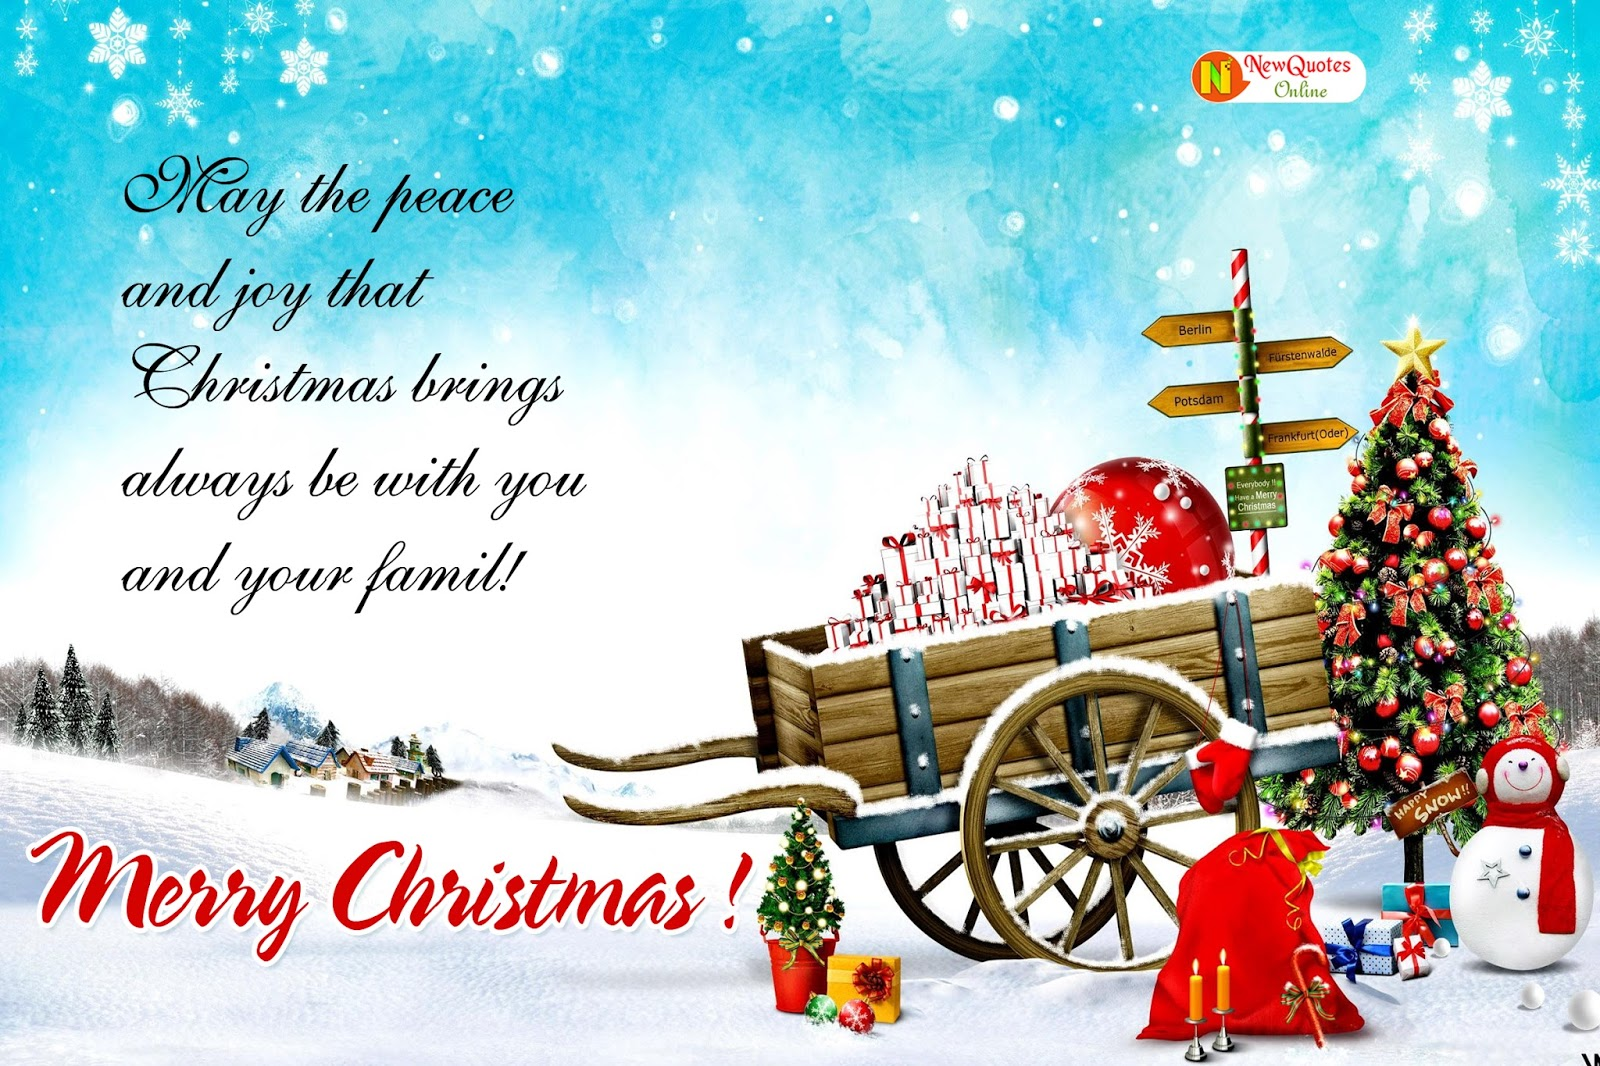 Telugu christmas greetings quotes wallpapers new quotes christmas quotes greetings wishes images sayings pics photos m4hsunfo